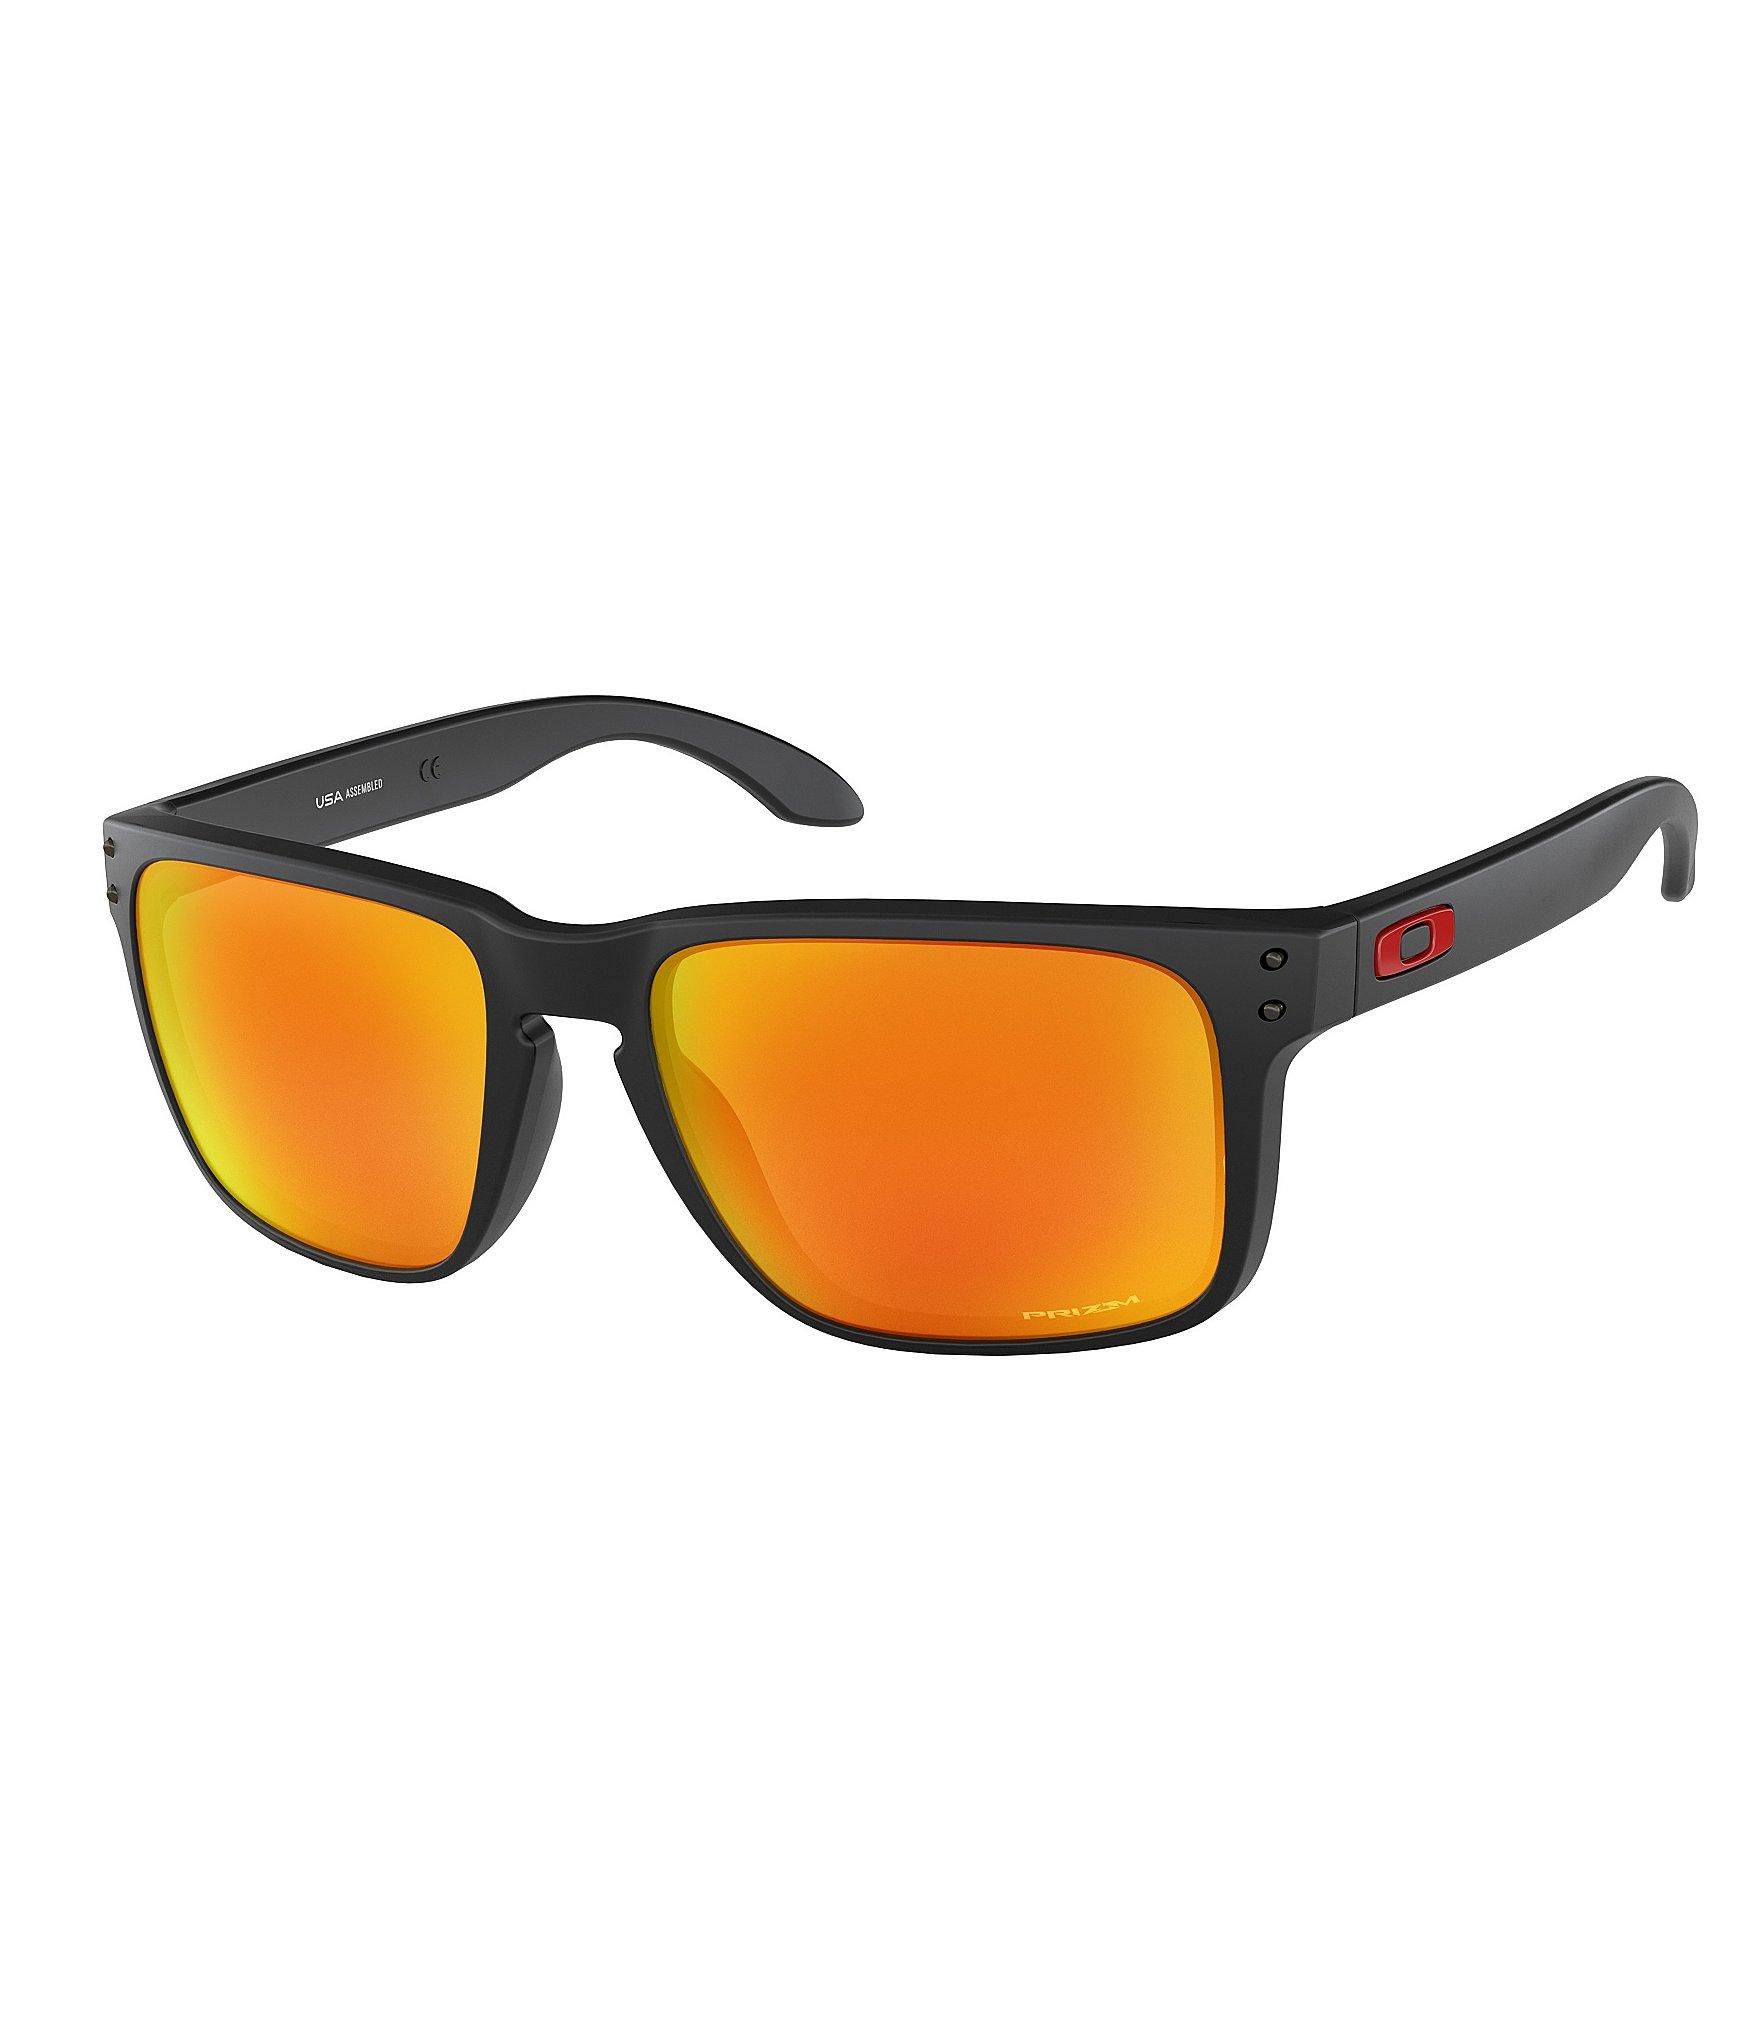 Oakley Orange Holbrook XL Square Sunglasses